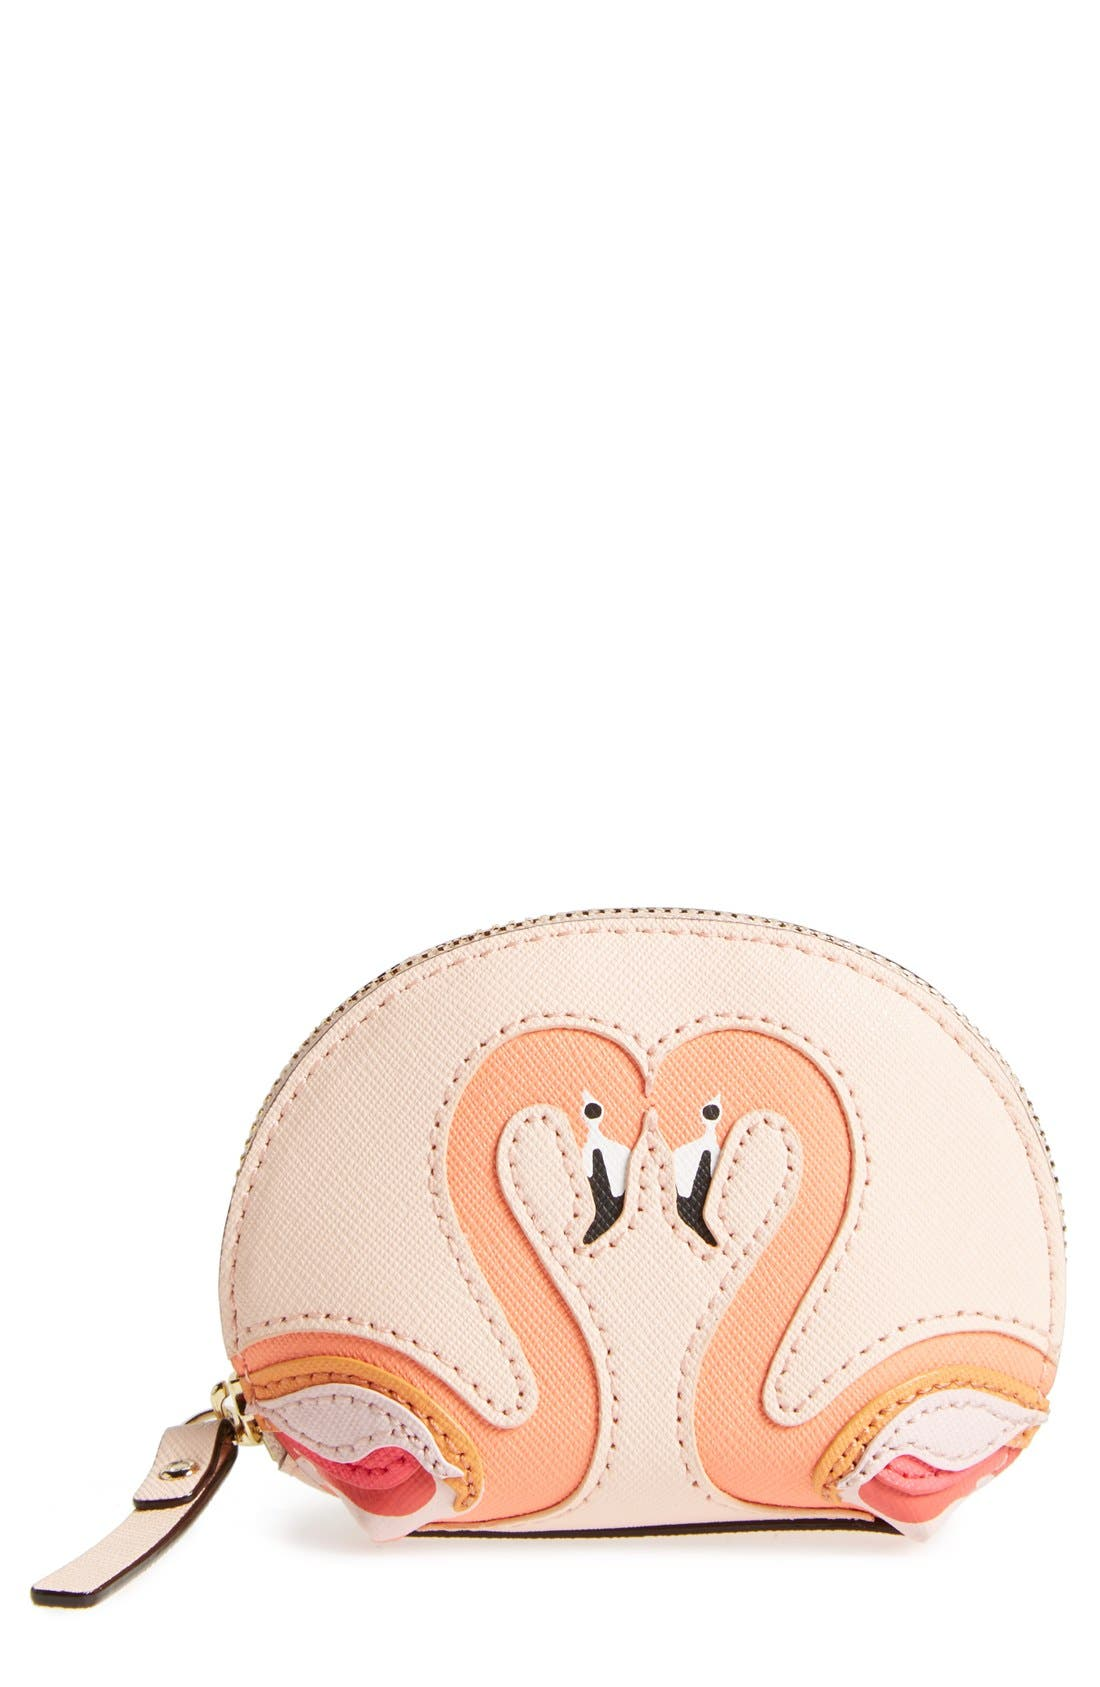 Main Image - kate spade new york 'strut flamingo' coin purse